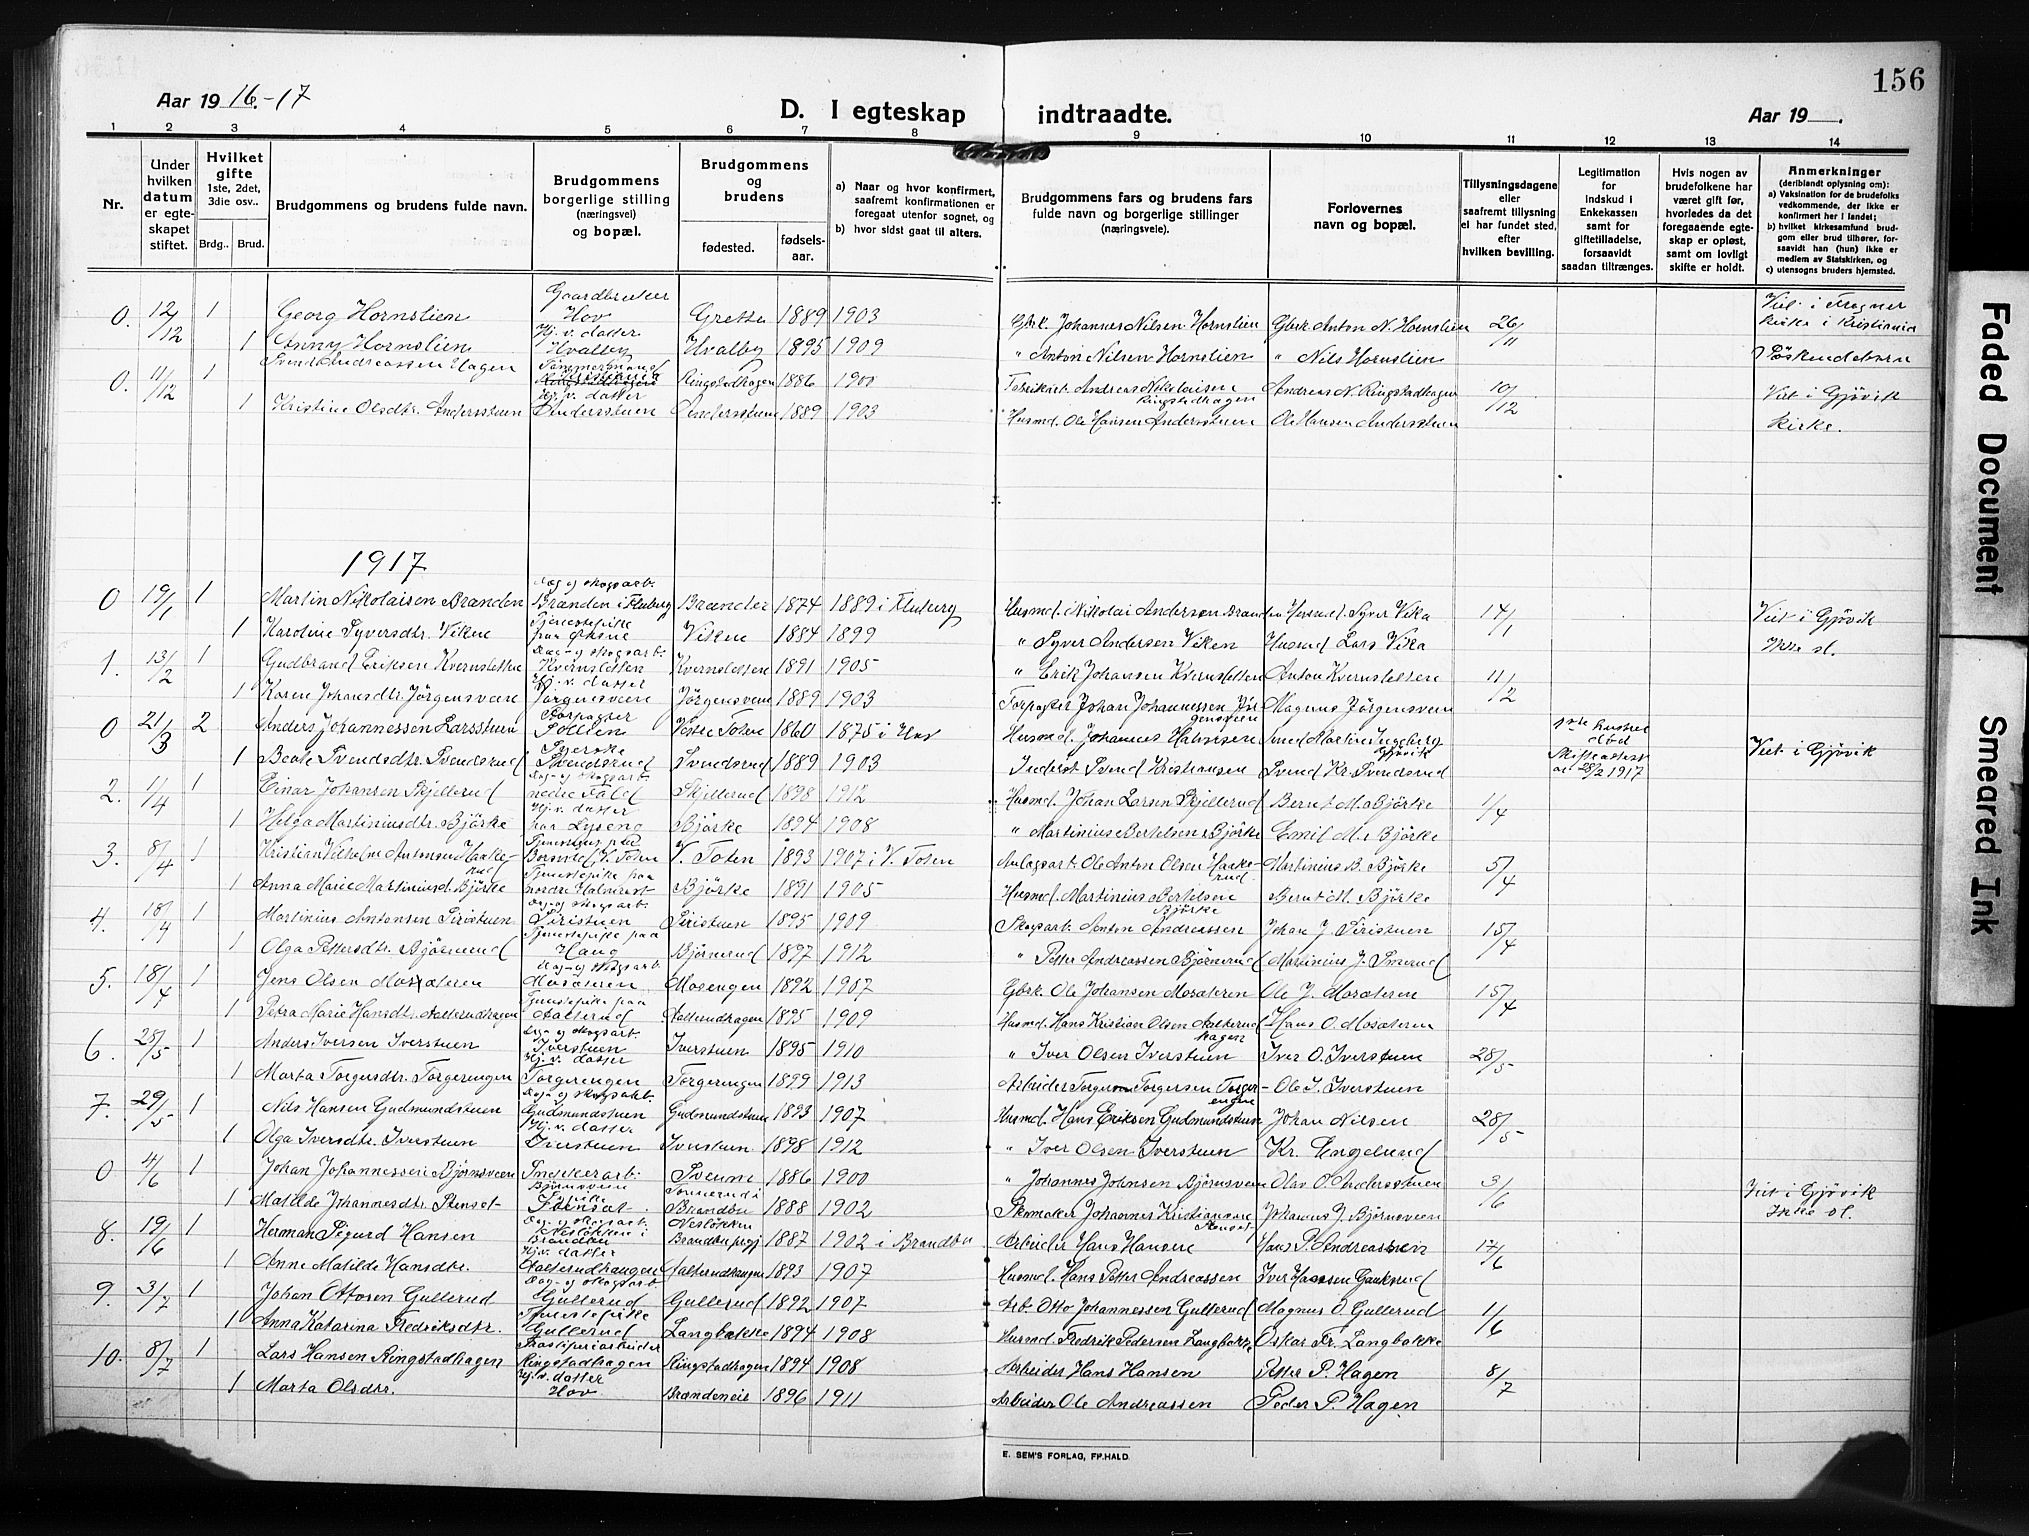 SAH, Søndre Land prestekontor, L/L0007: Klokkerbok nr. 7, 1915-1932, s. 156